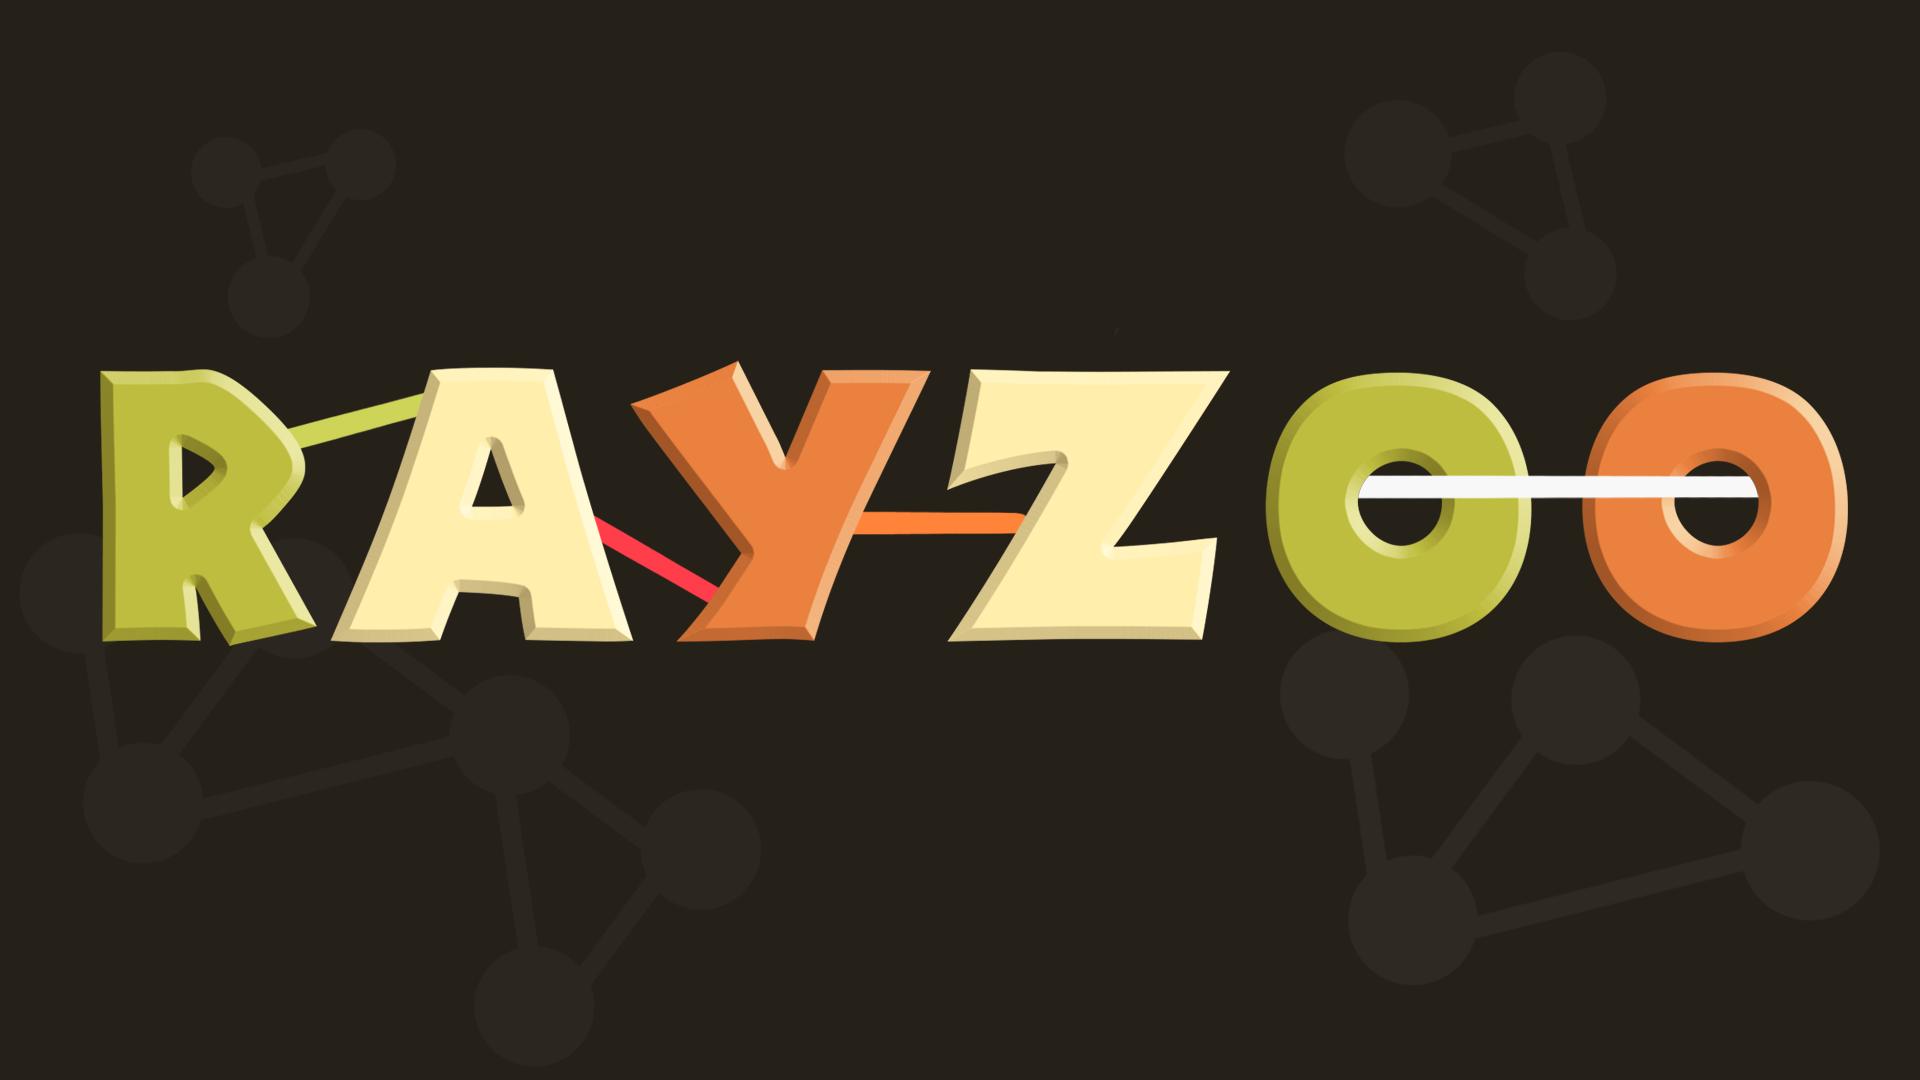 Rayzoo